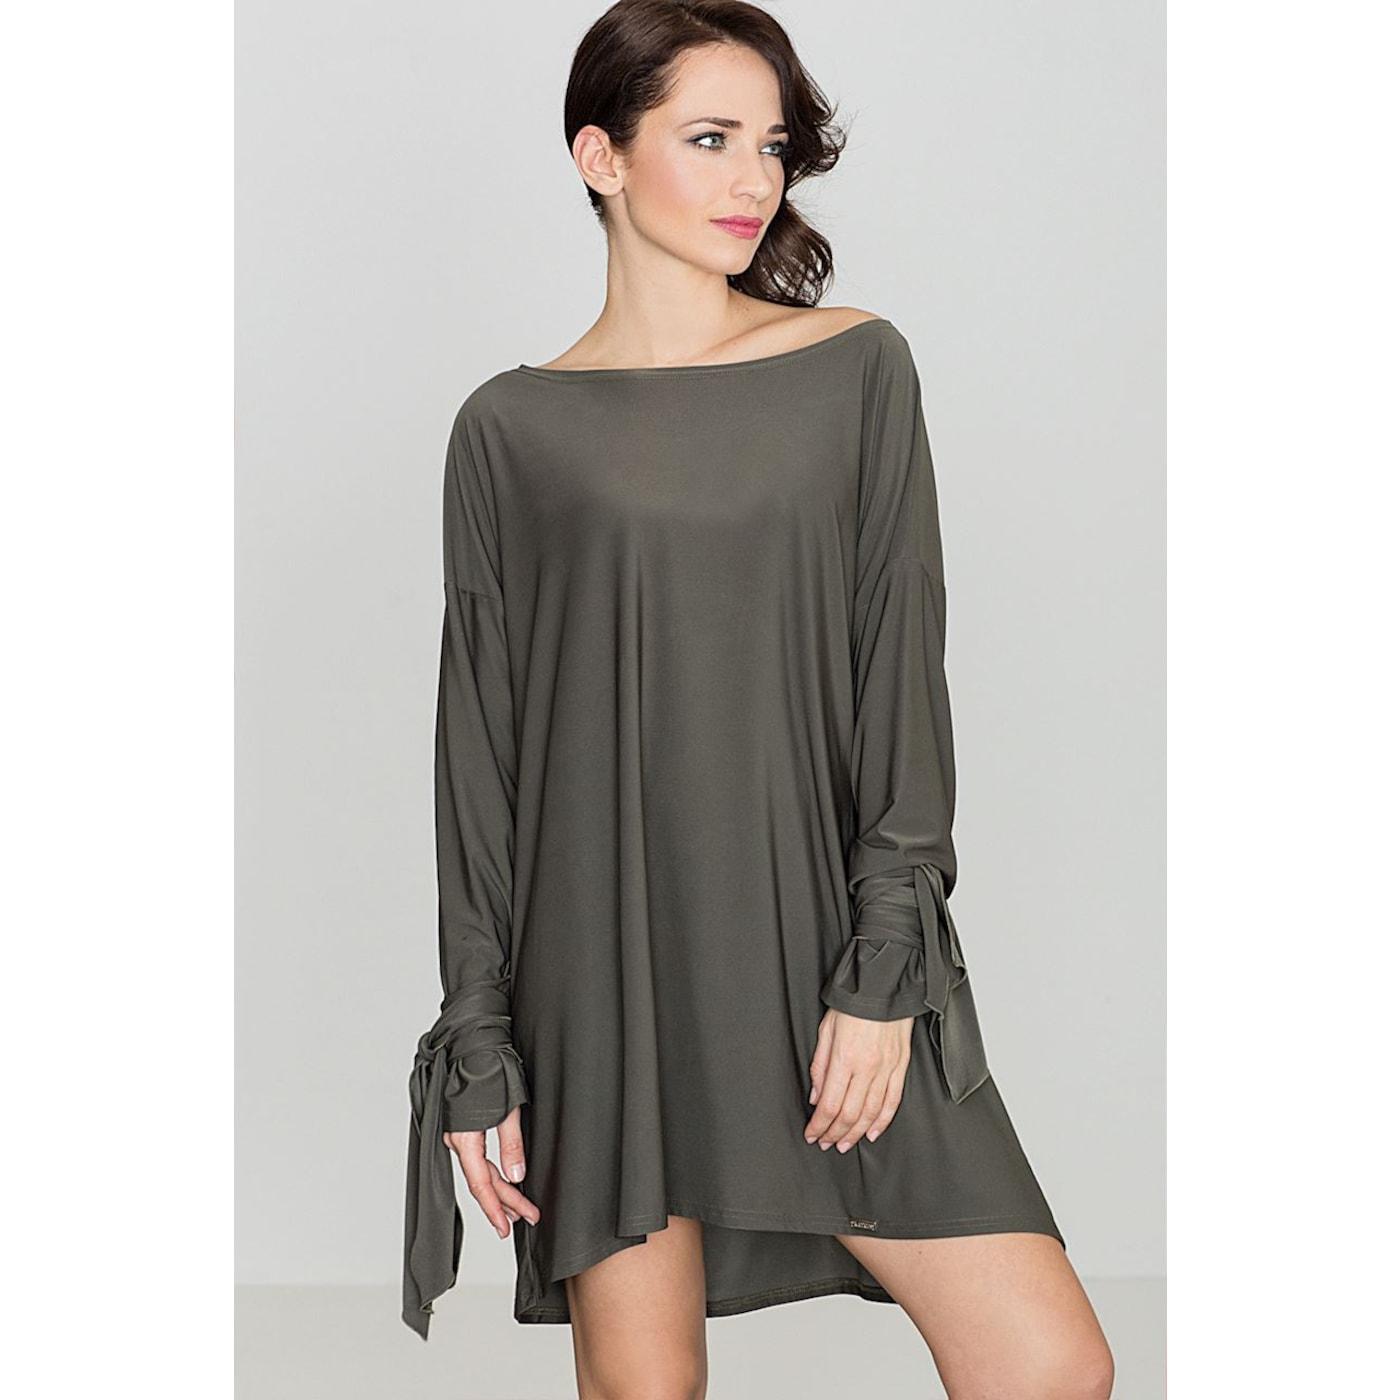 Katrus Womans Dress K439 dámské Olive green L